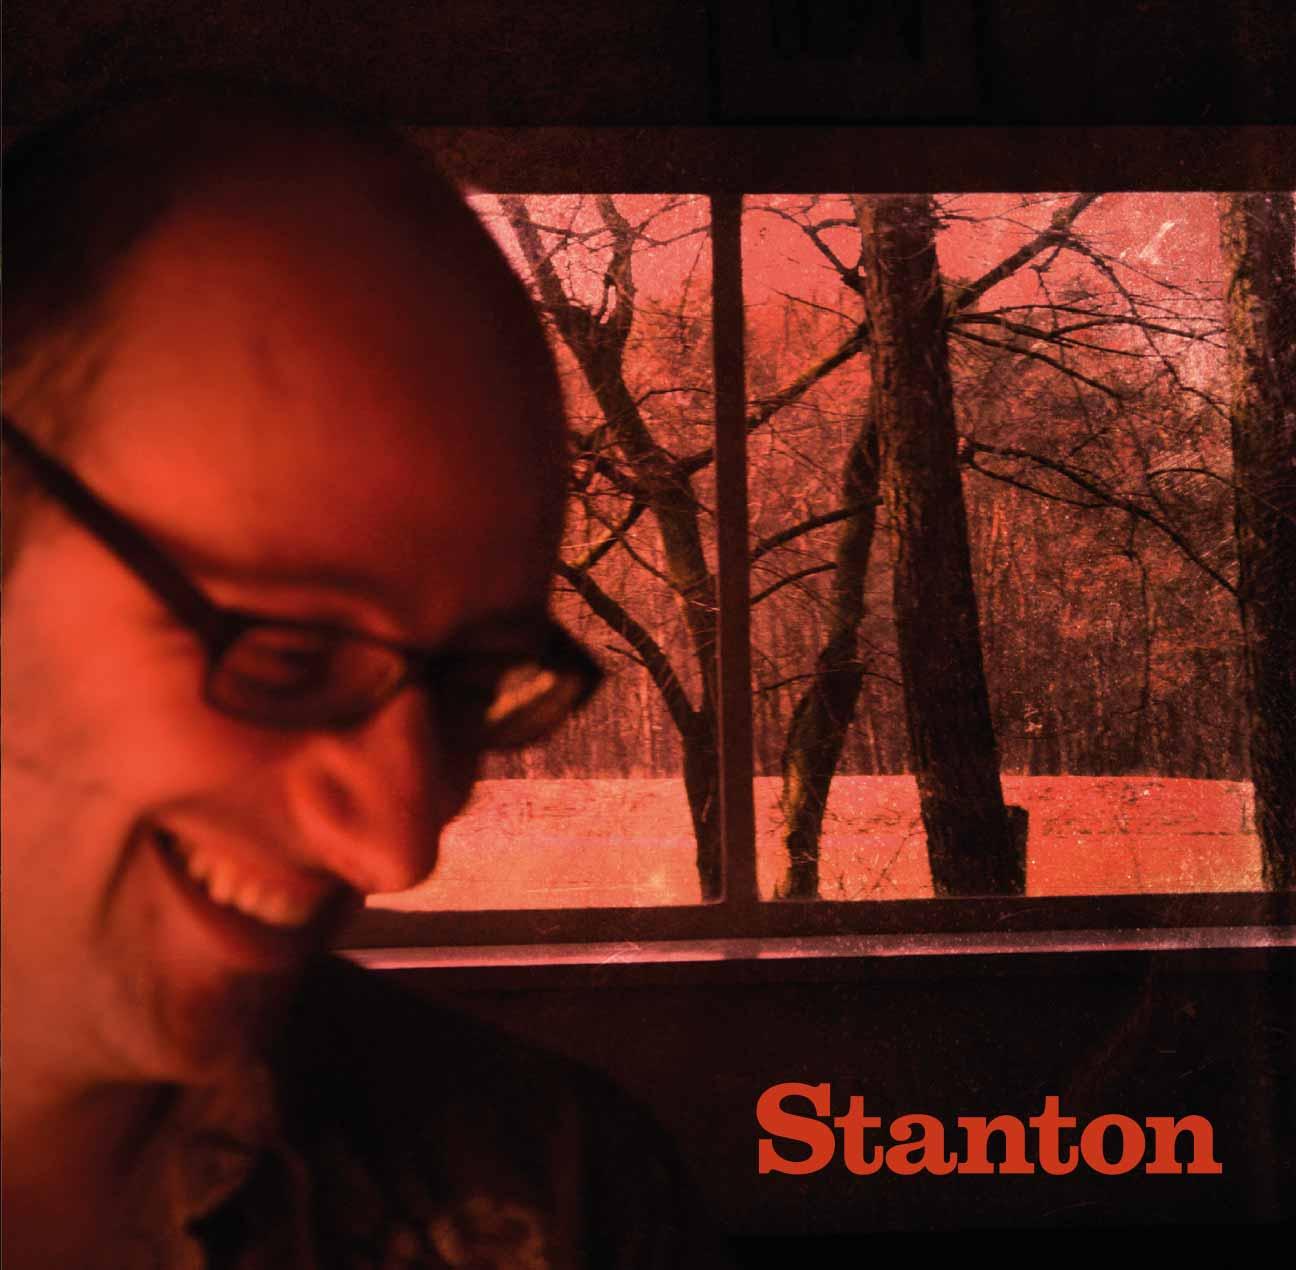 Stanton's debut album